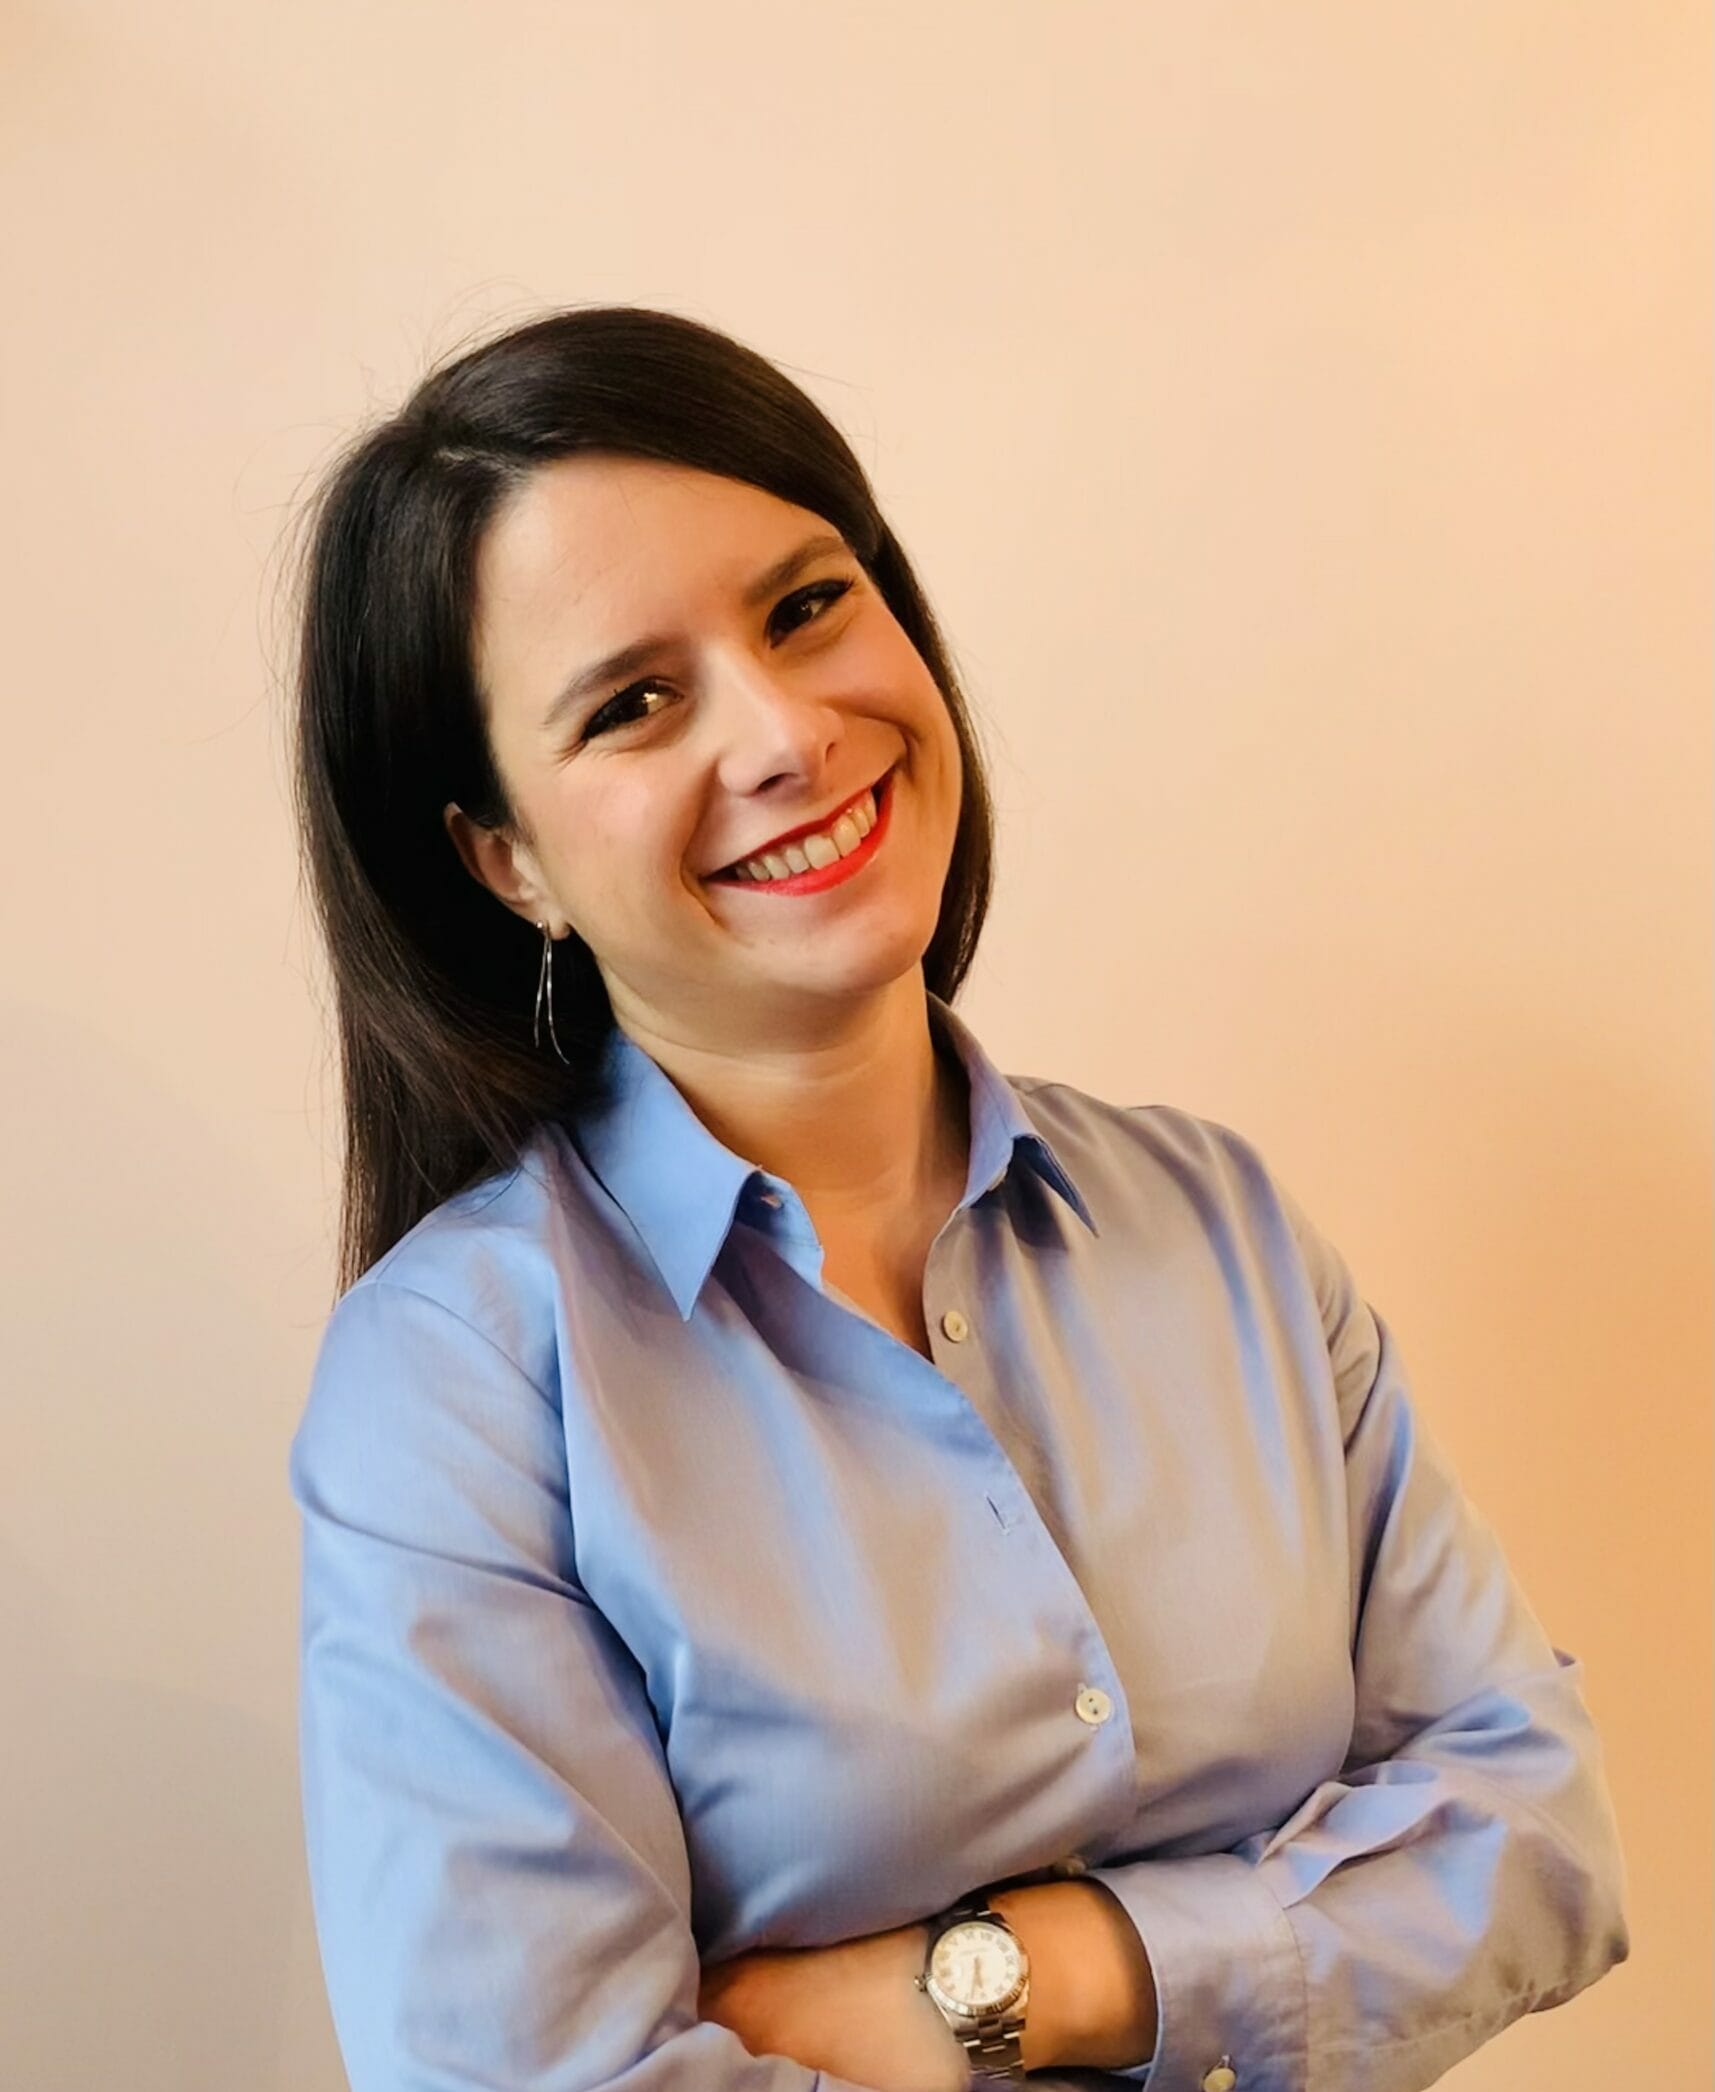 Chiara Bisighin